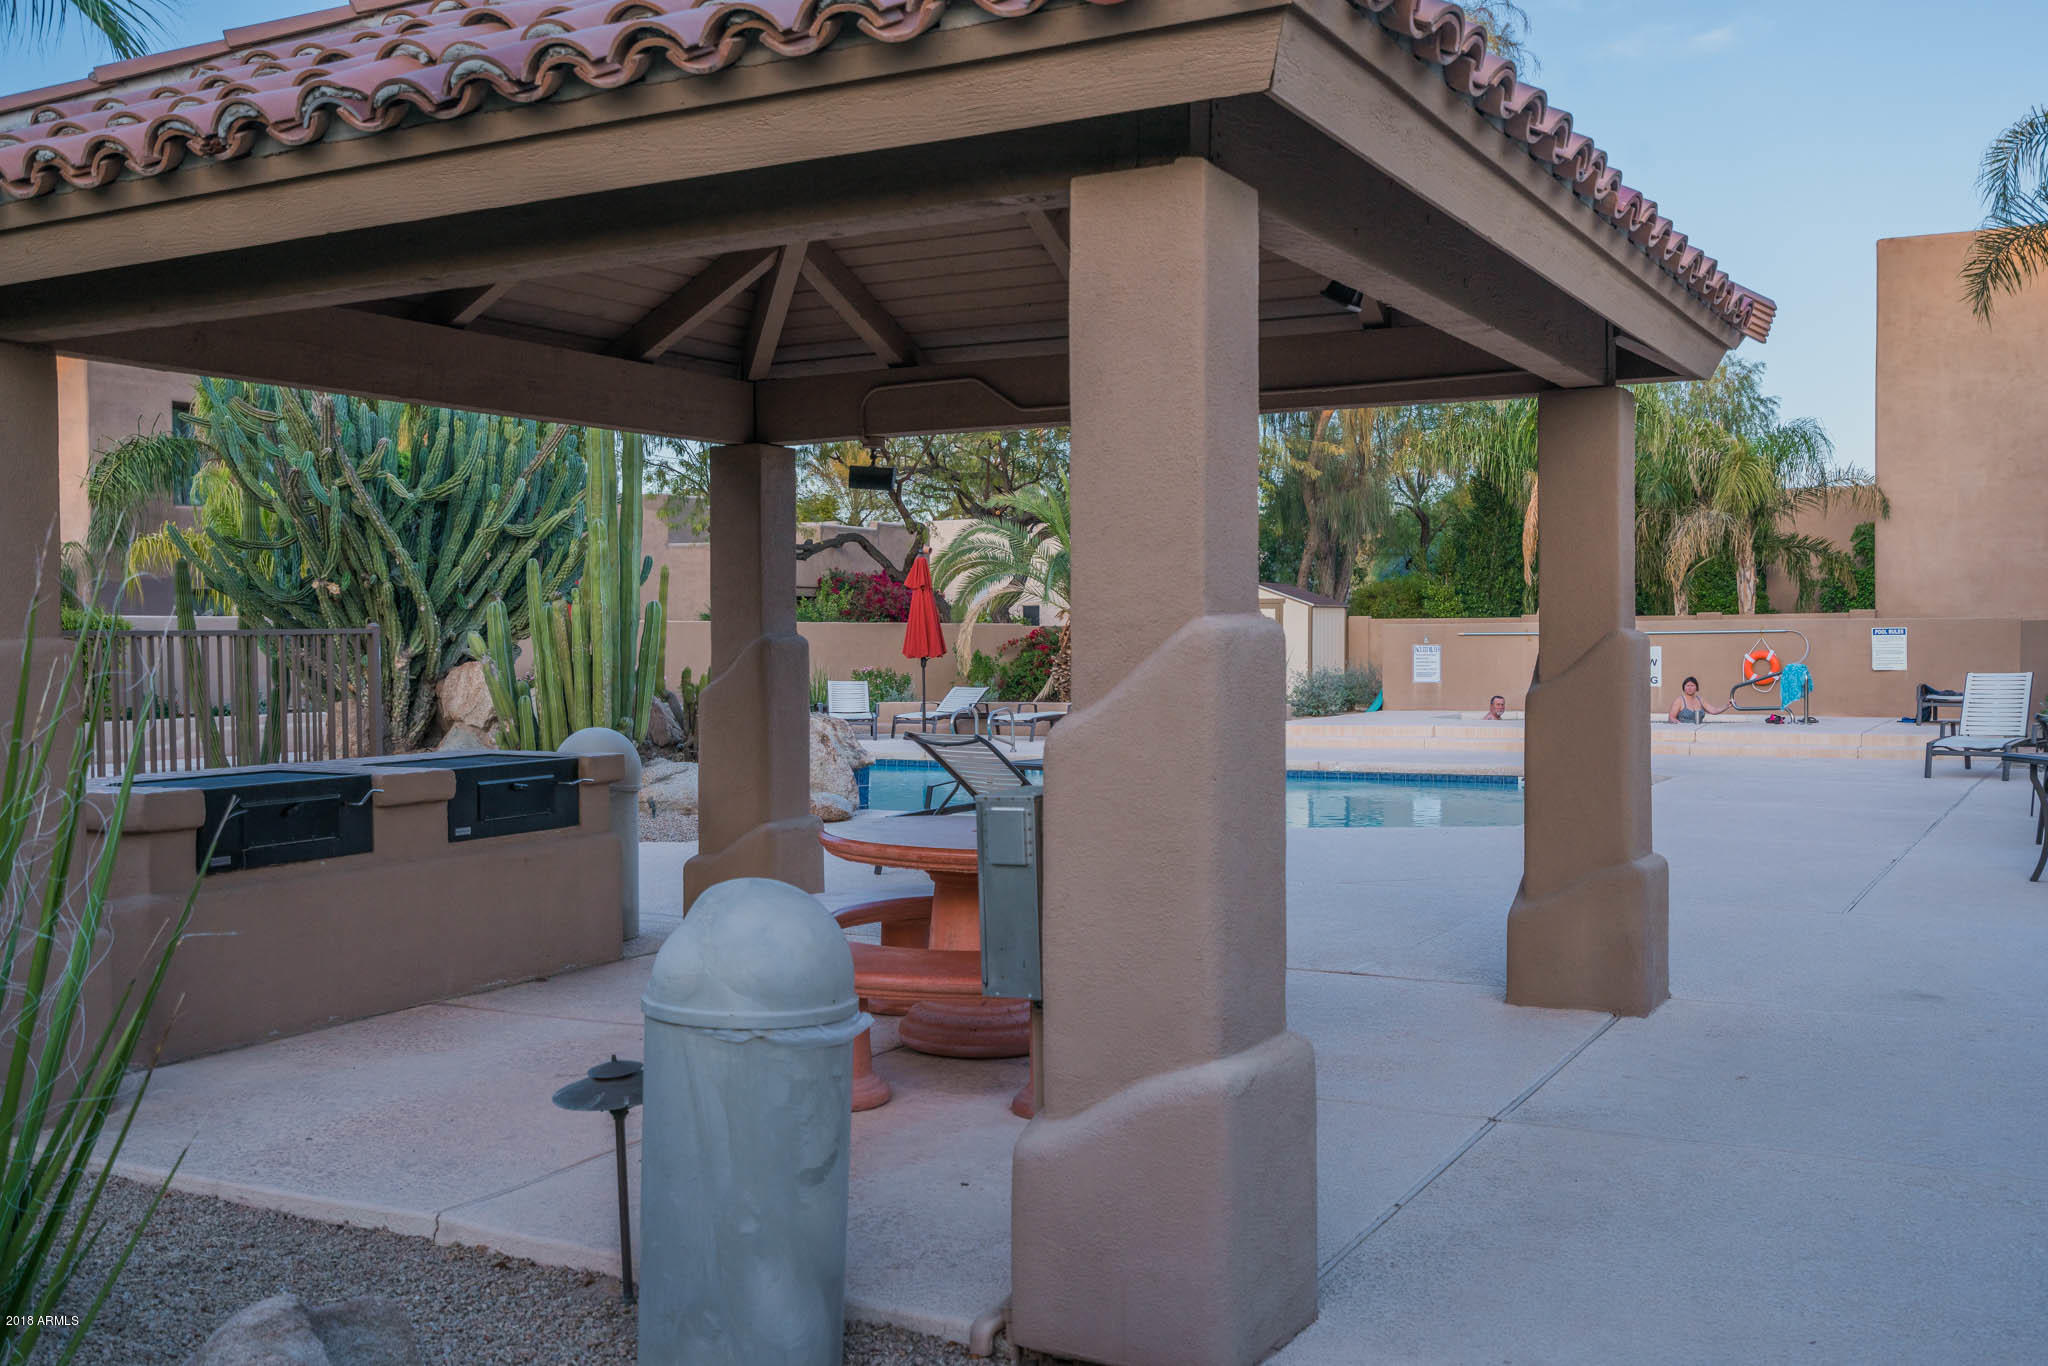 MLS 5737206 8374 E Joshua Tree Lane, Scottsdale, AZ 85250 Scottsdale AZ Gated